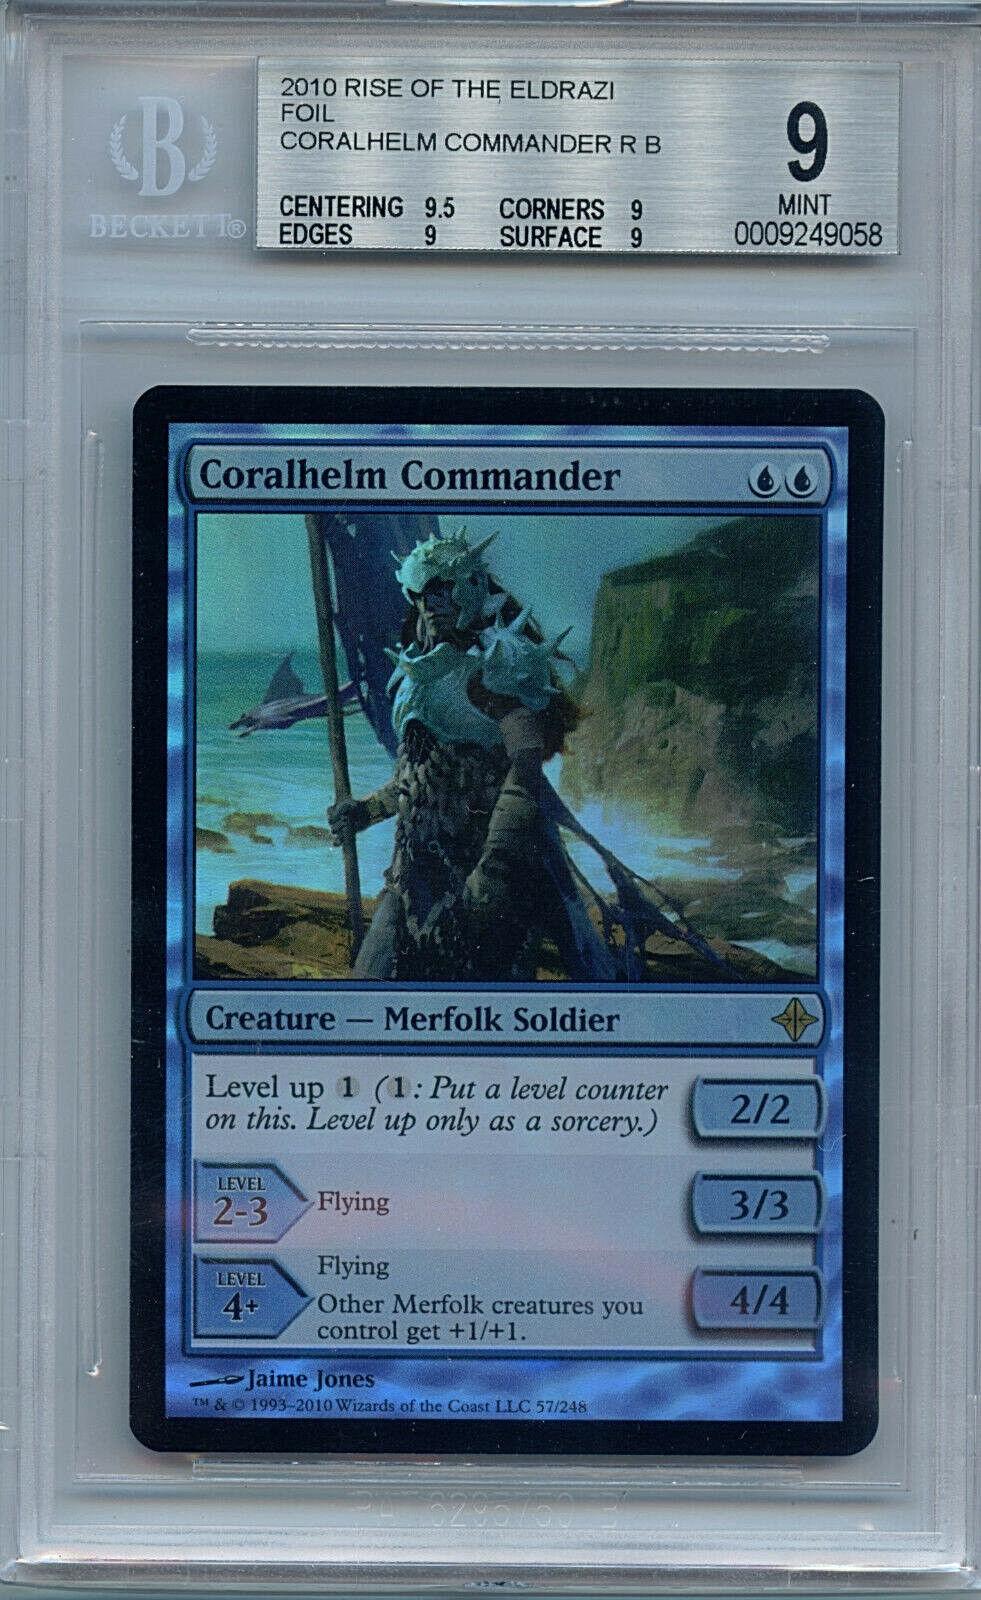 MTG Coral Helm Commander BGS 9 Mint Rise o t Eldrazi Foil Magic card Amricons 58